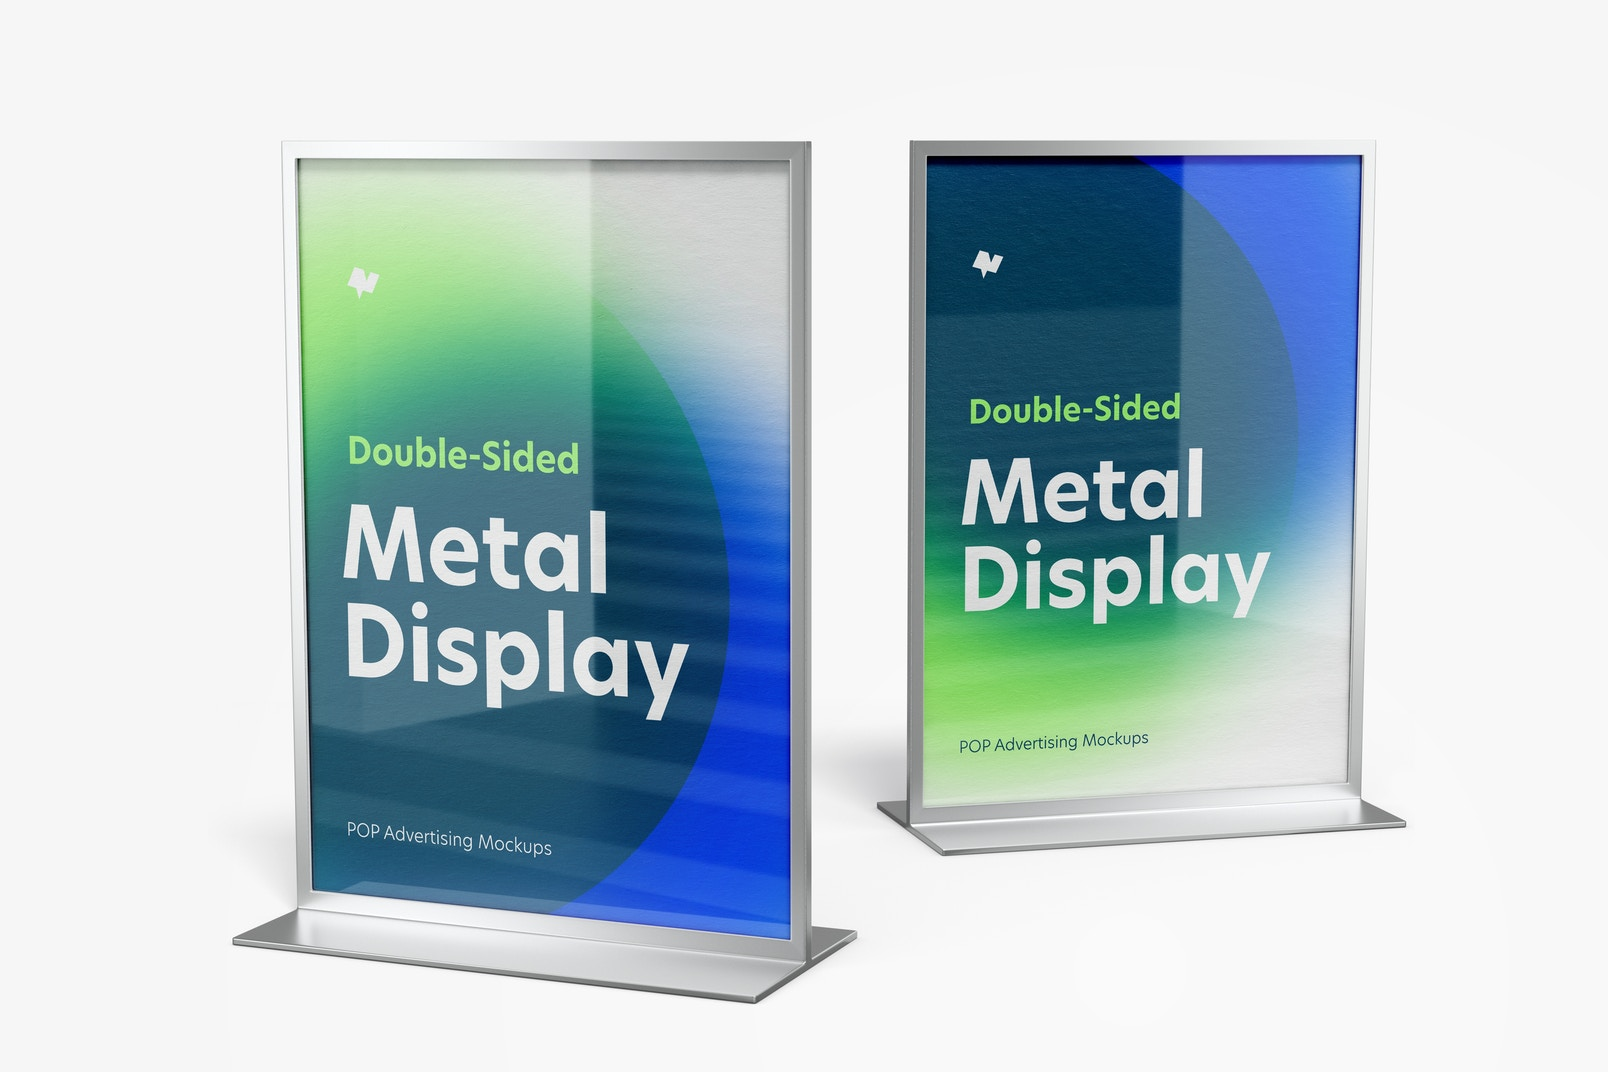 Double-Sided Poster Metal Desktop Displays Mockup